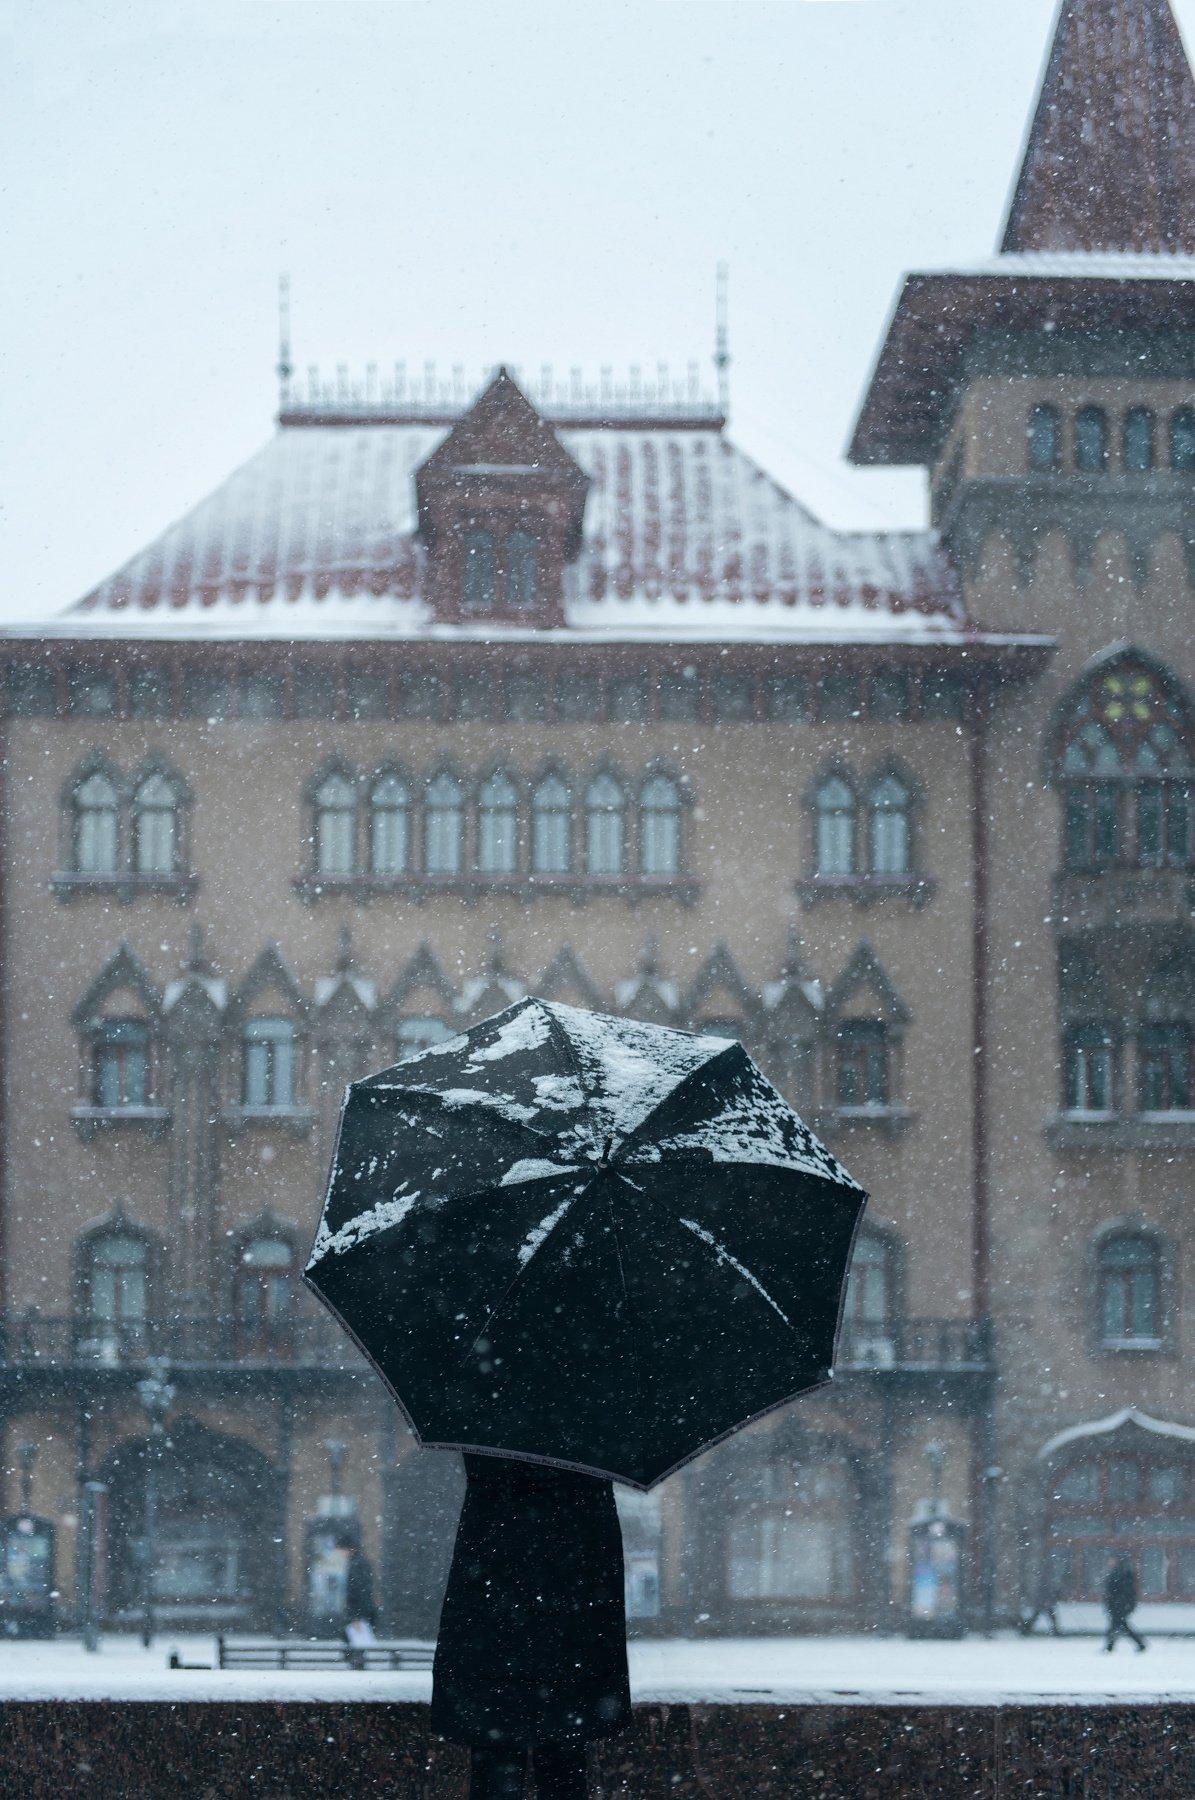 город, архитектура, зонт, саратов, Алексей Ермаков